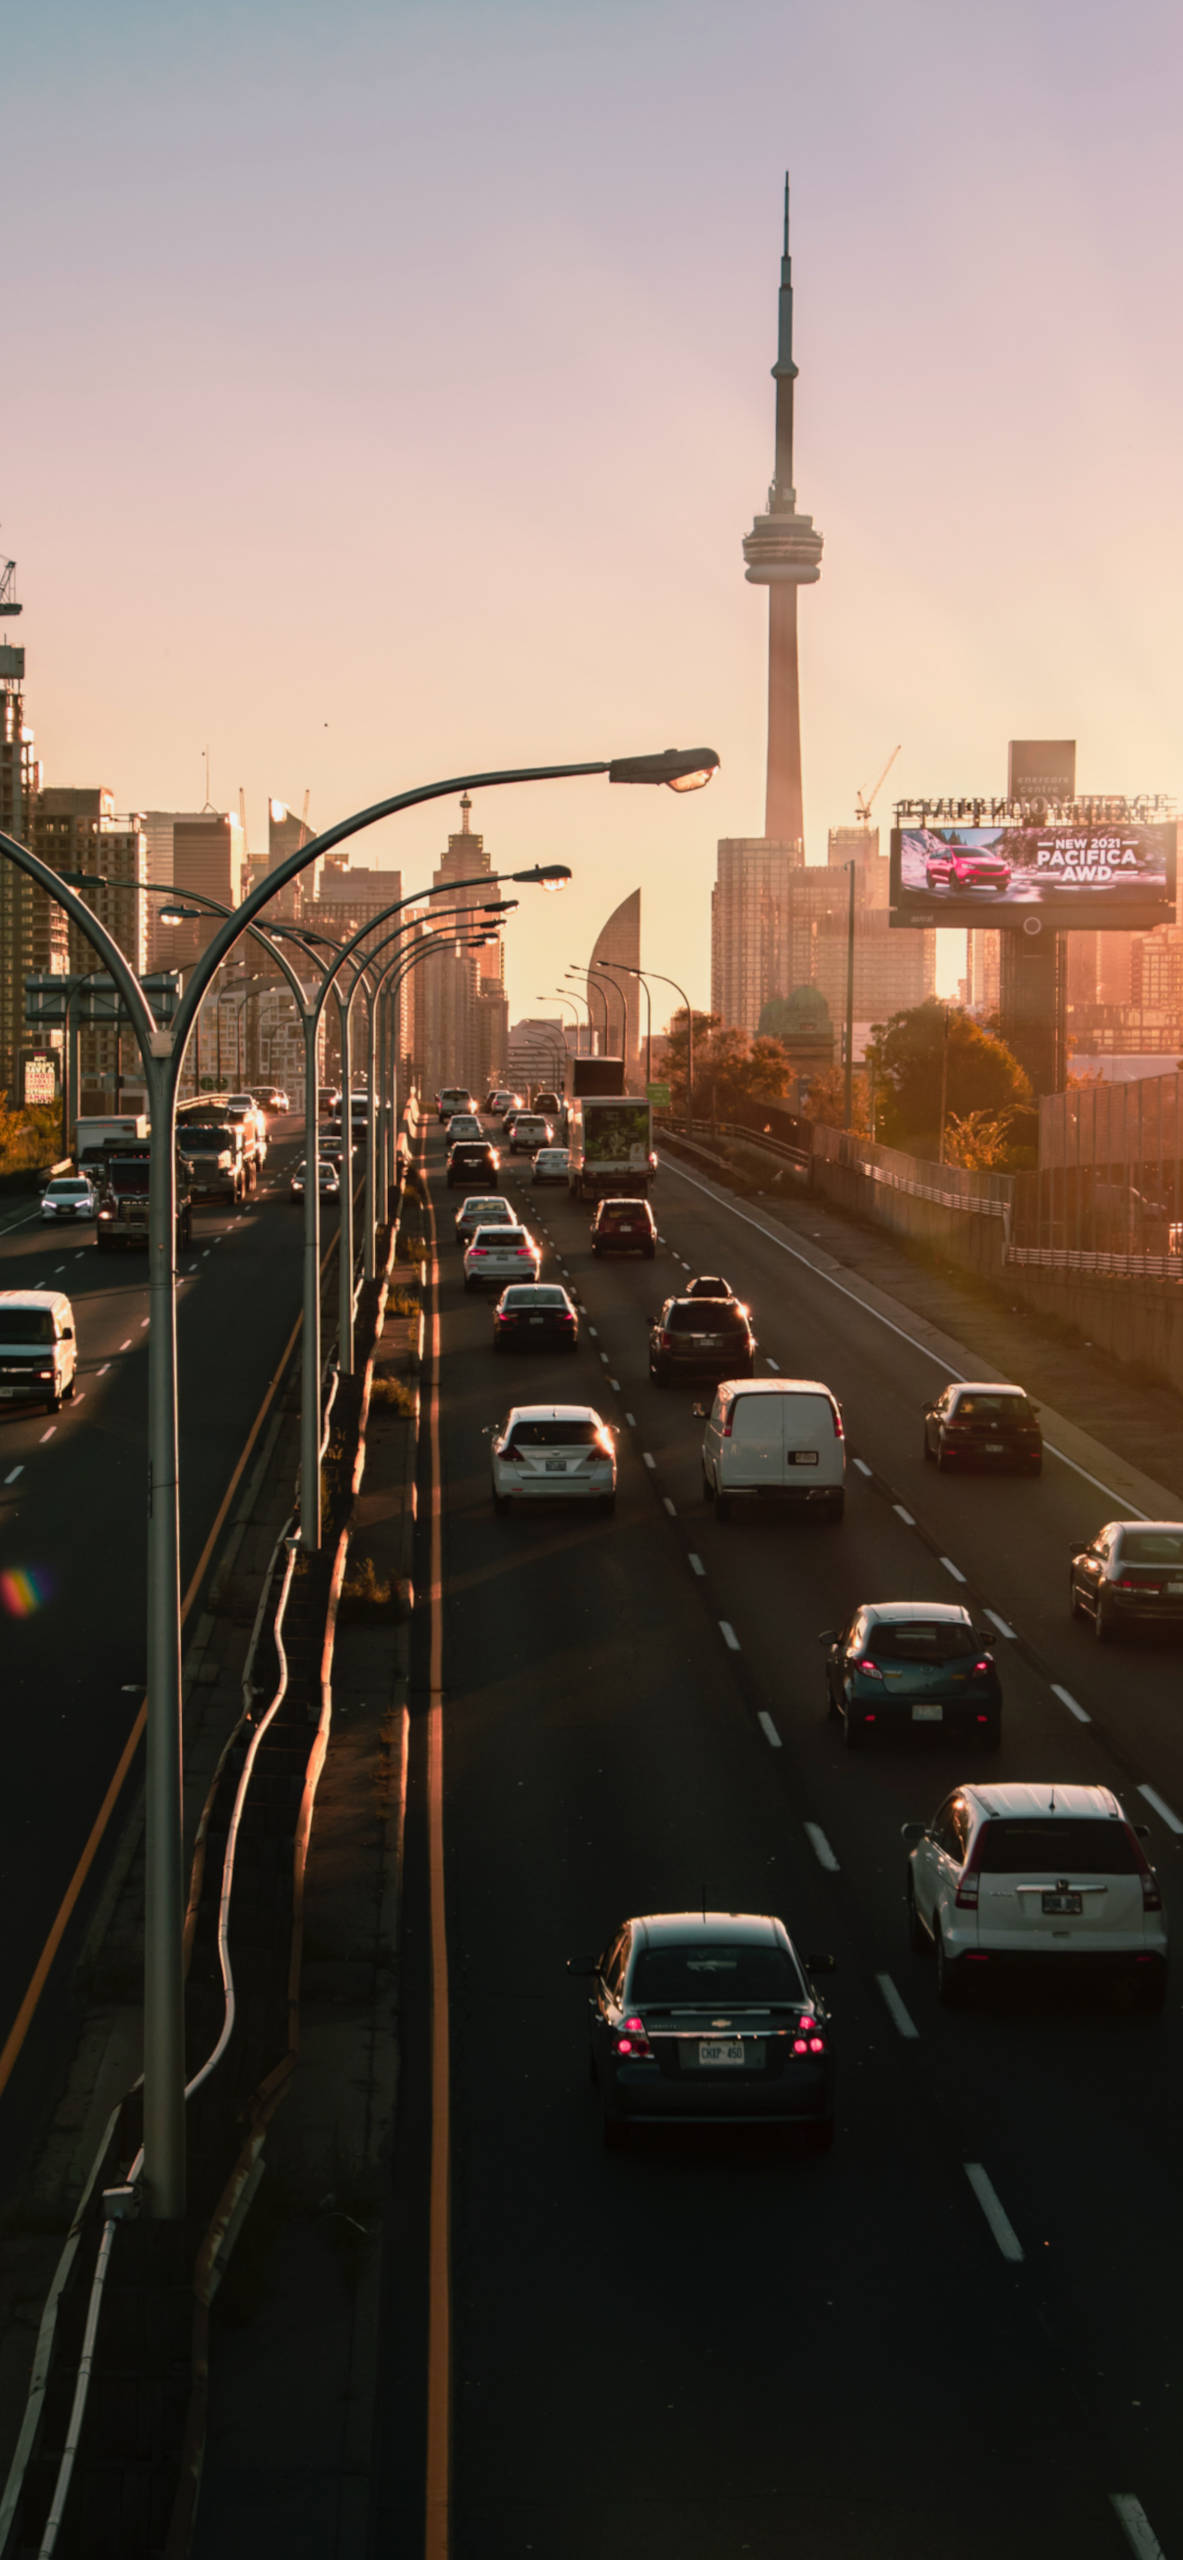 iPhone wallpapers toronto canada dufferin street bridge Toronto